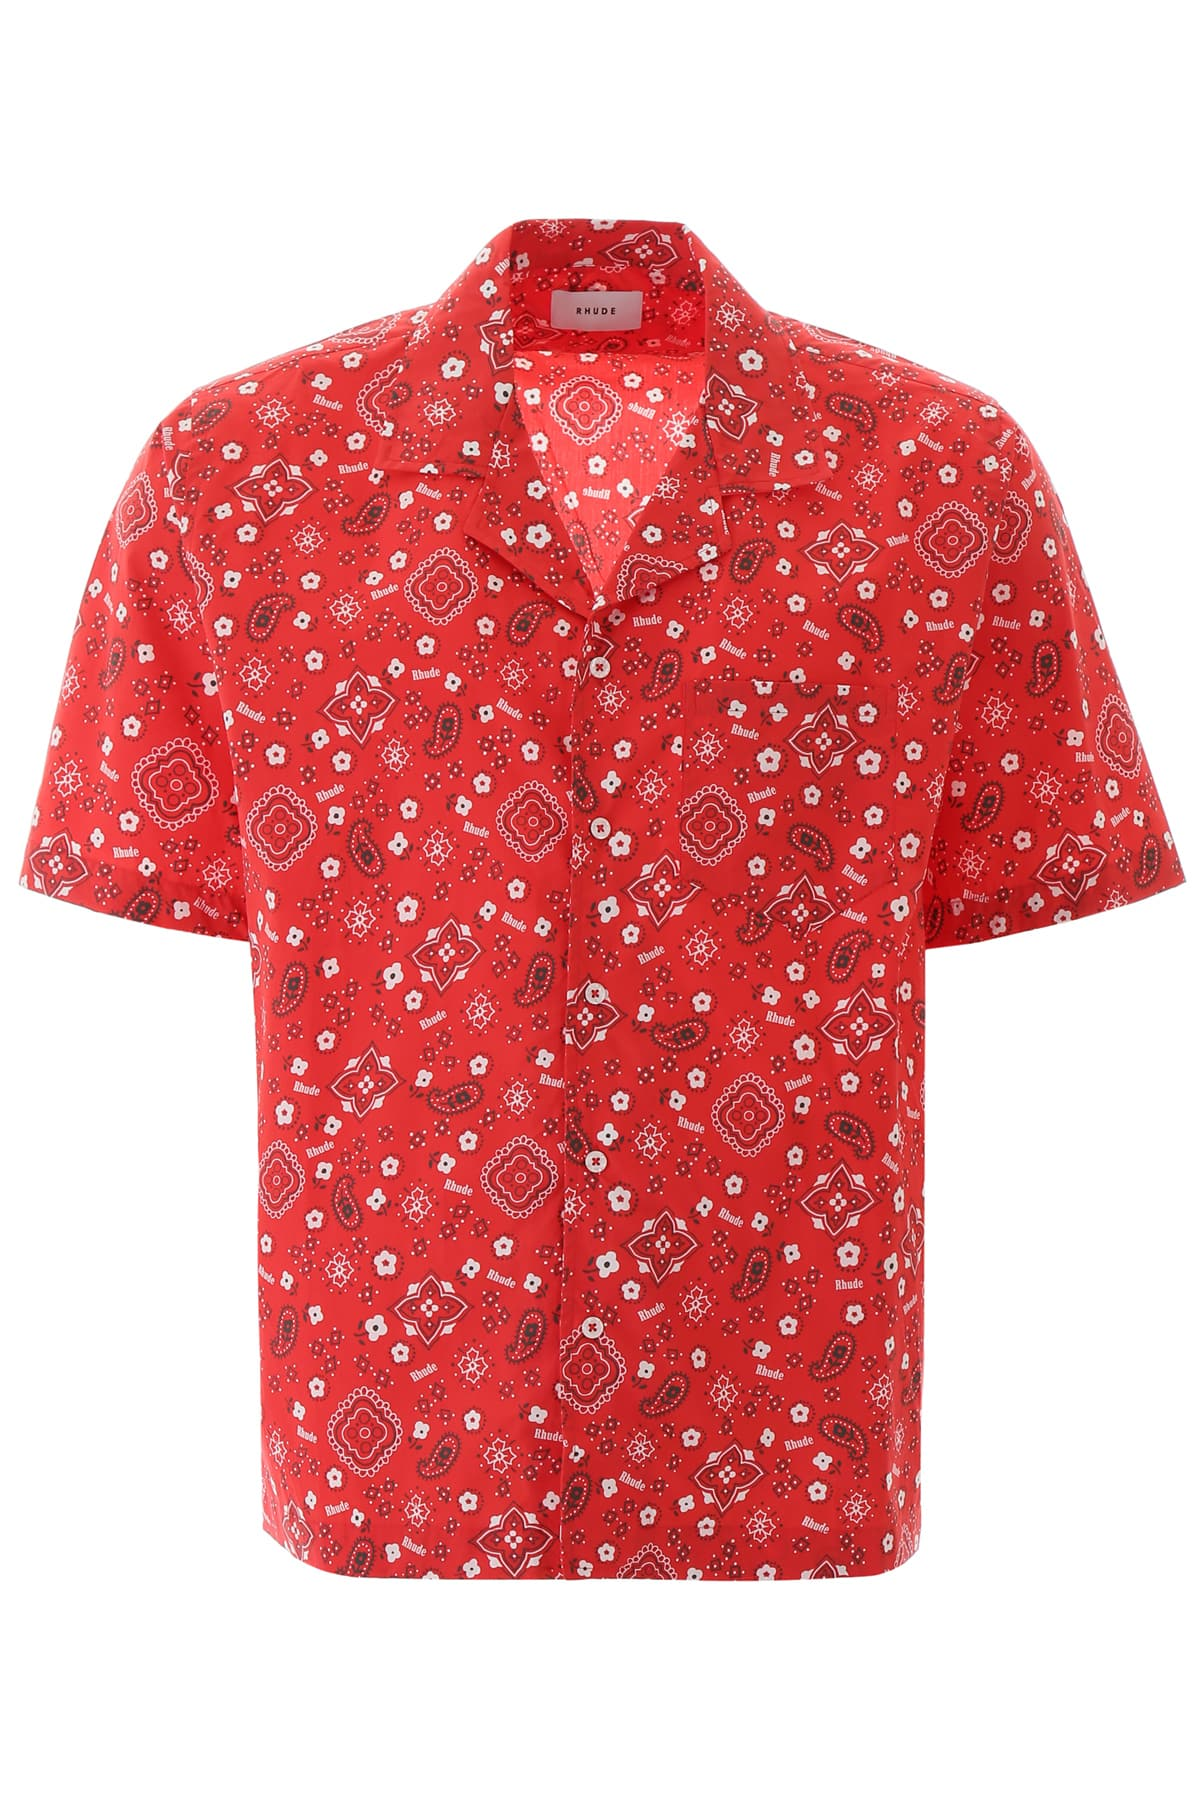 RHUDE BANDANA PRINT SHIRT L Red, White Cotton